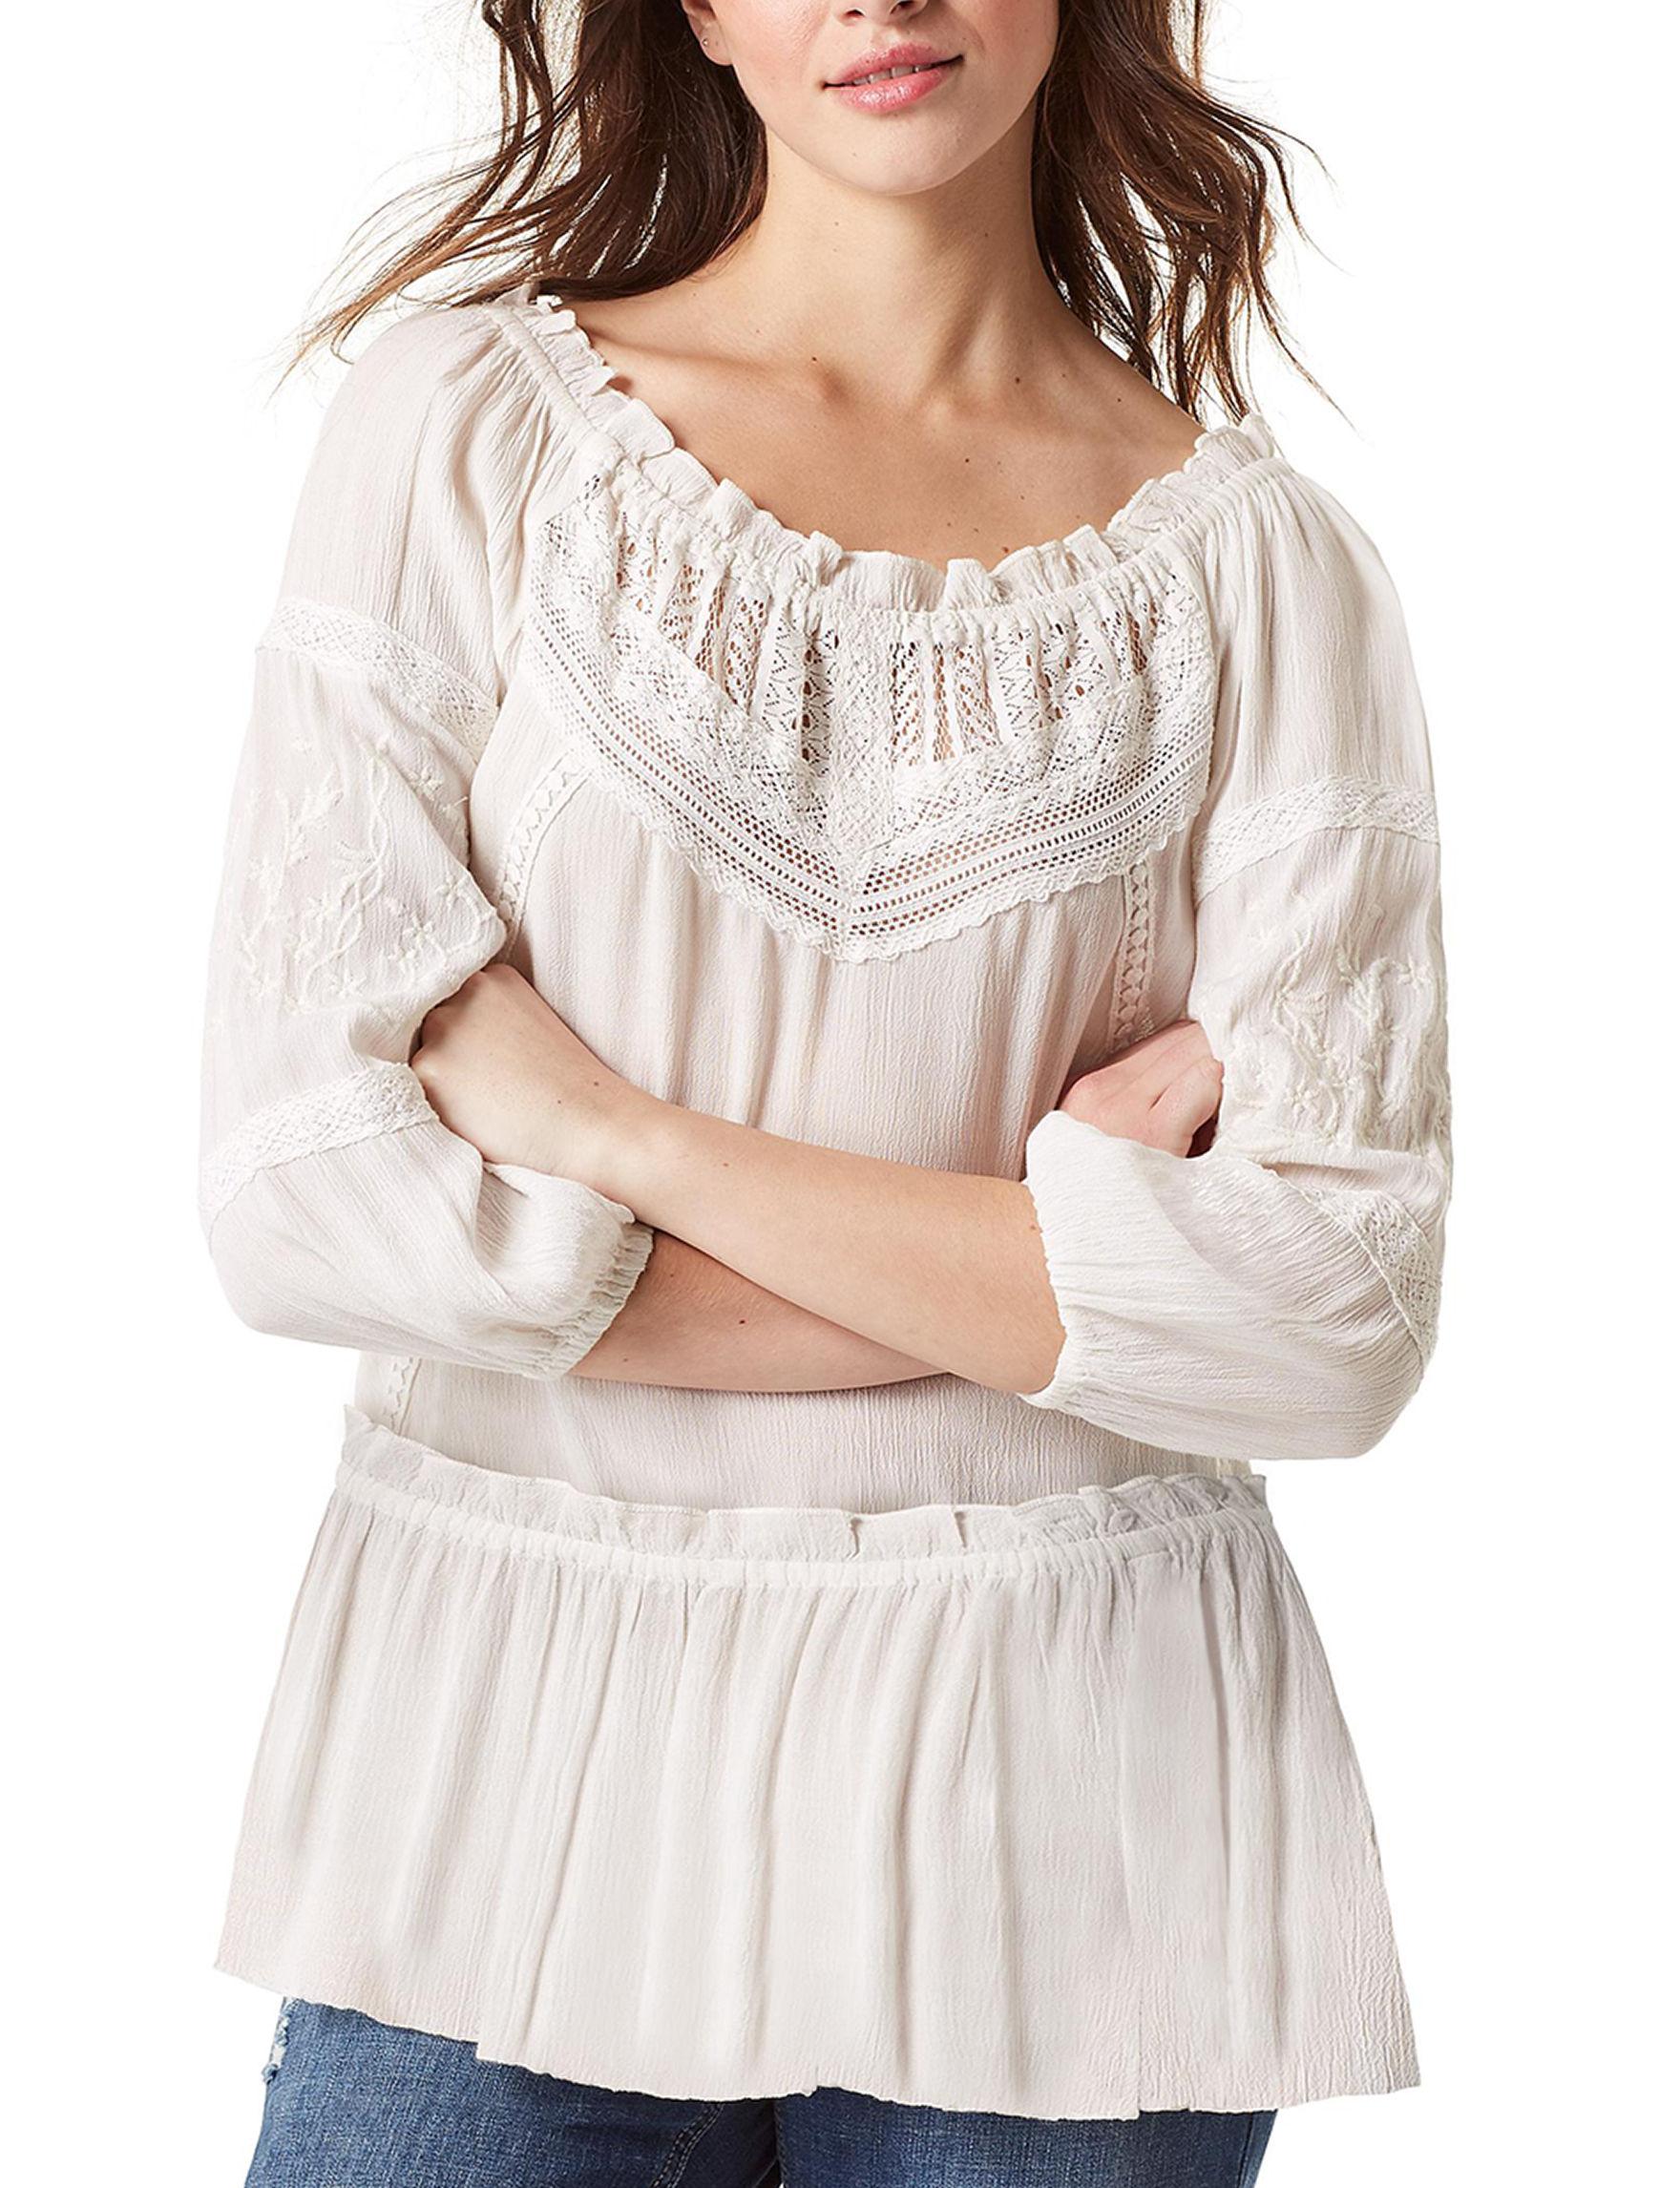 Vintage America Blues White Shirts & Blouses Strapless